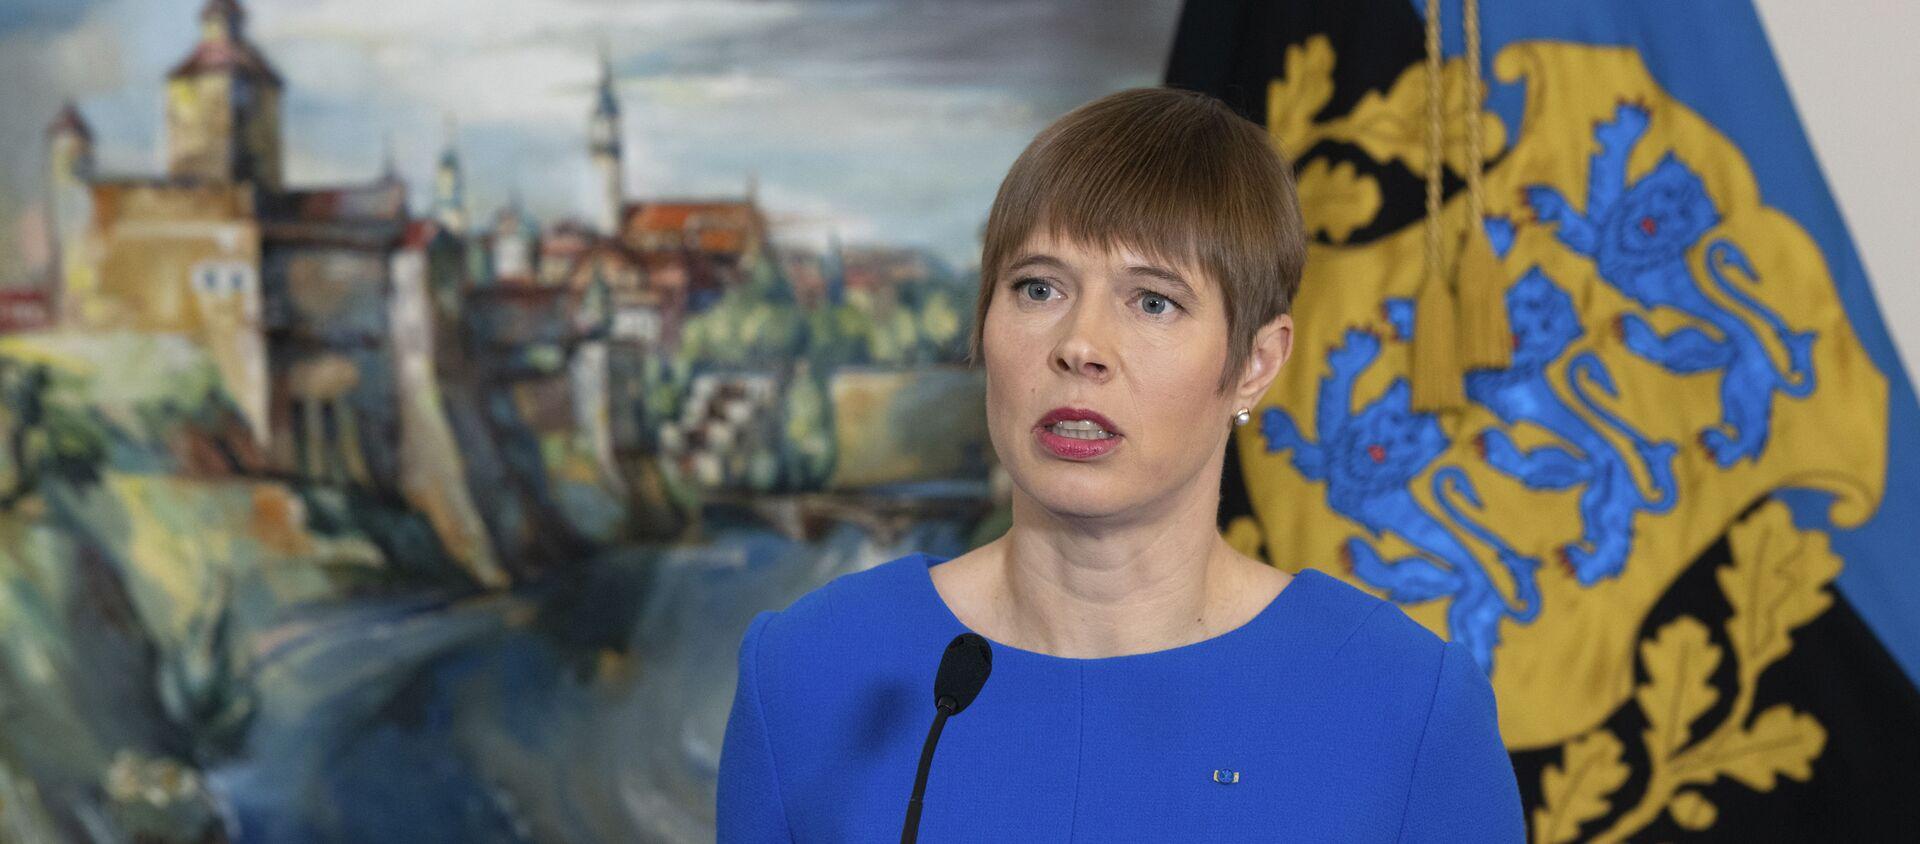 Tổng thống Estonia Kersti Kaljulaid - Sputnik Việt Nam, 1920, 30.08.2021